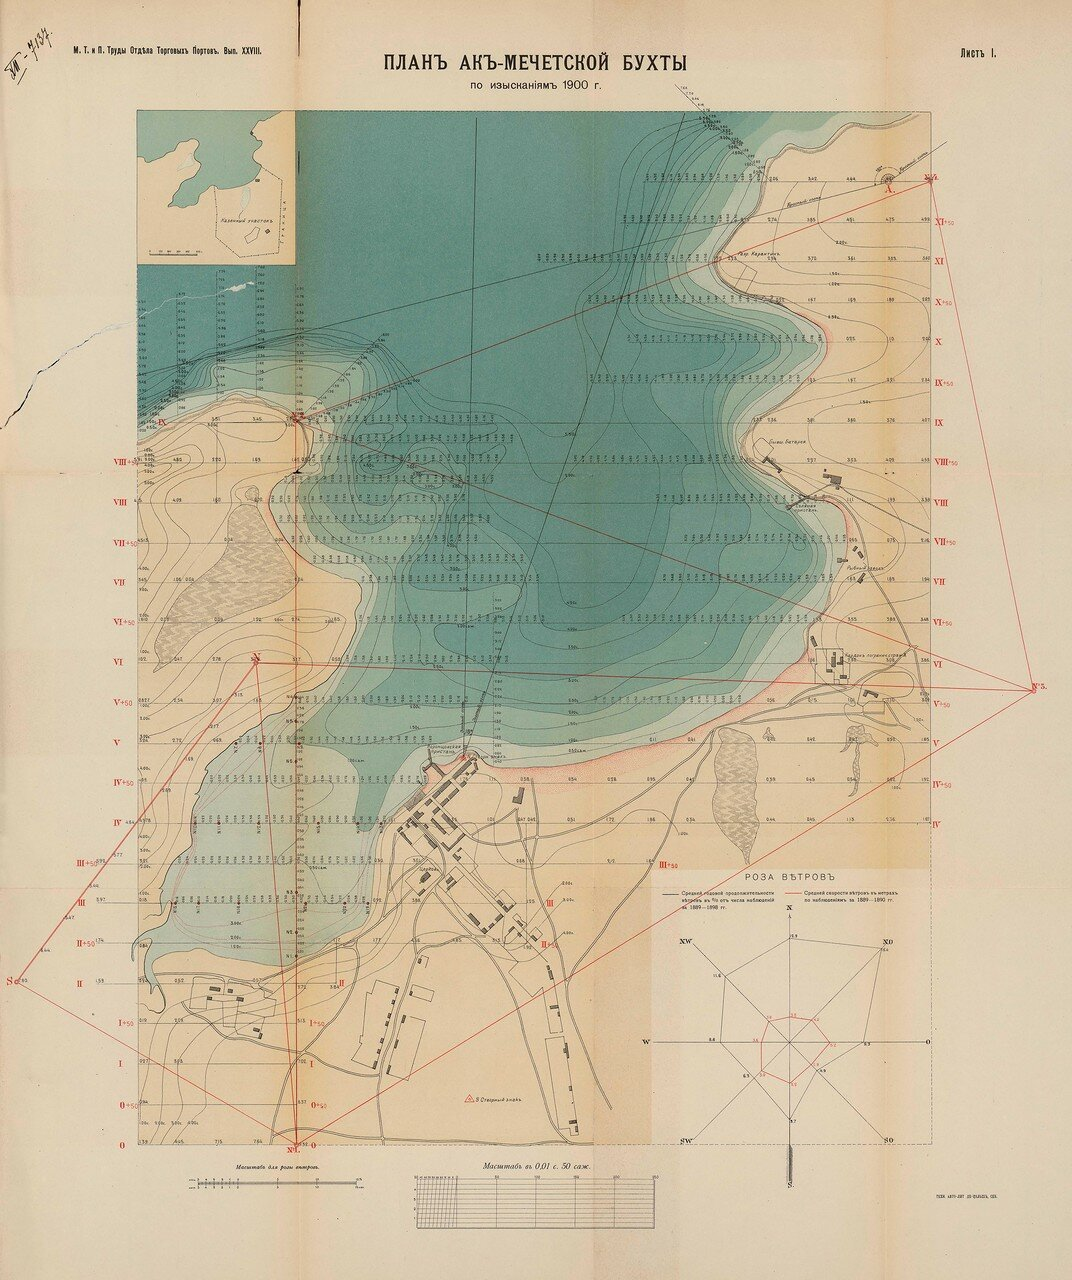 01. План Ак-Мечетской бухты. 1900